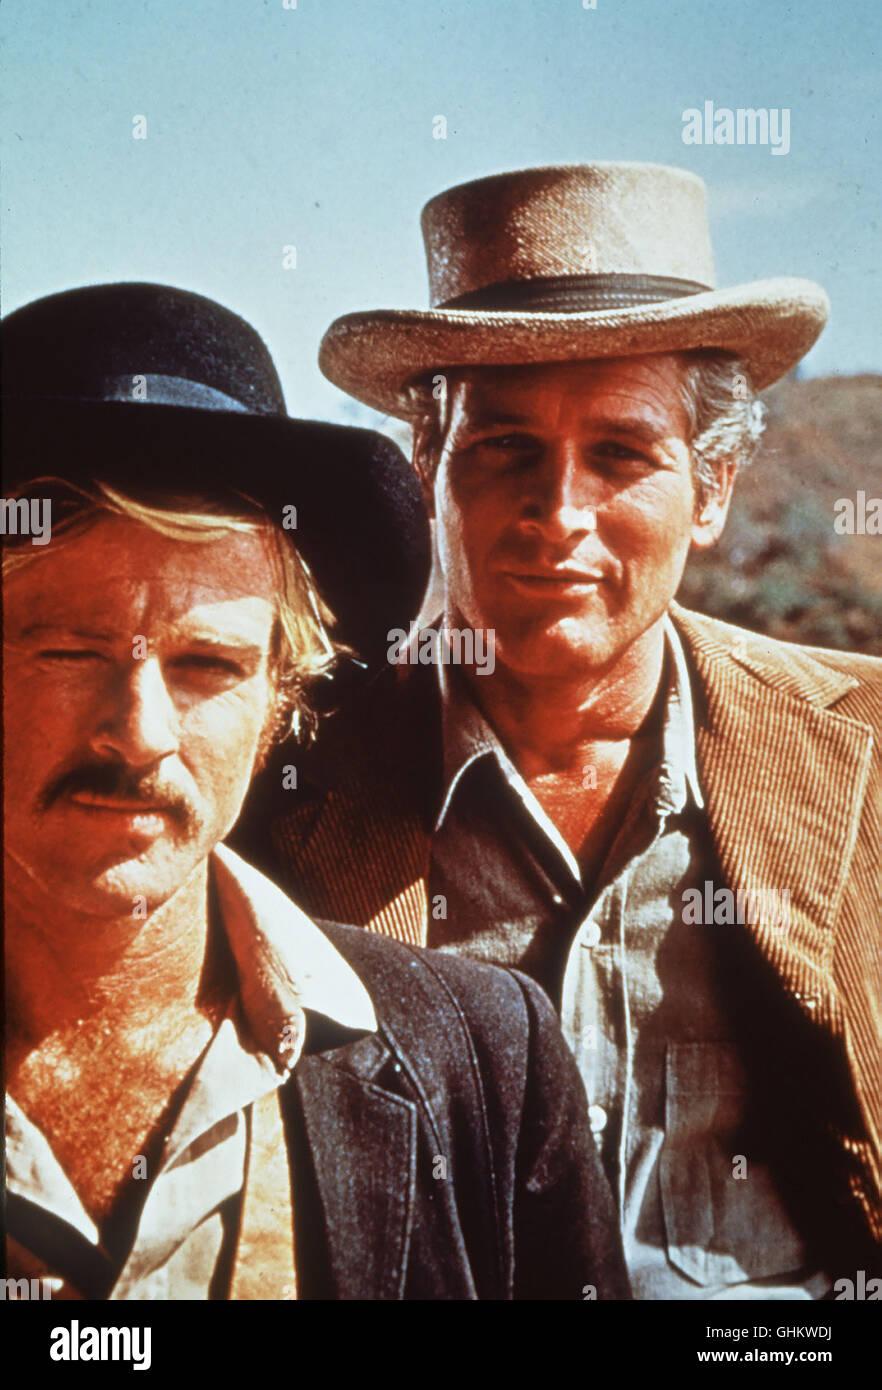 Zwei Banditen